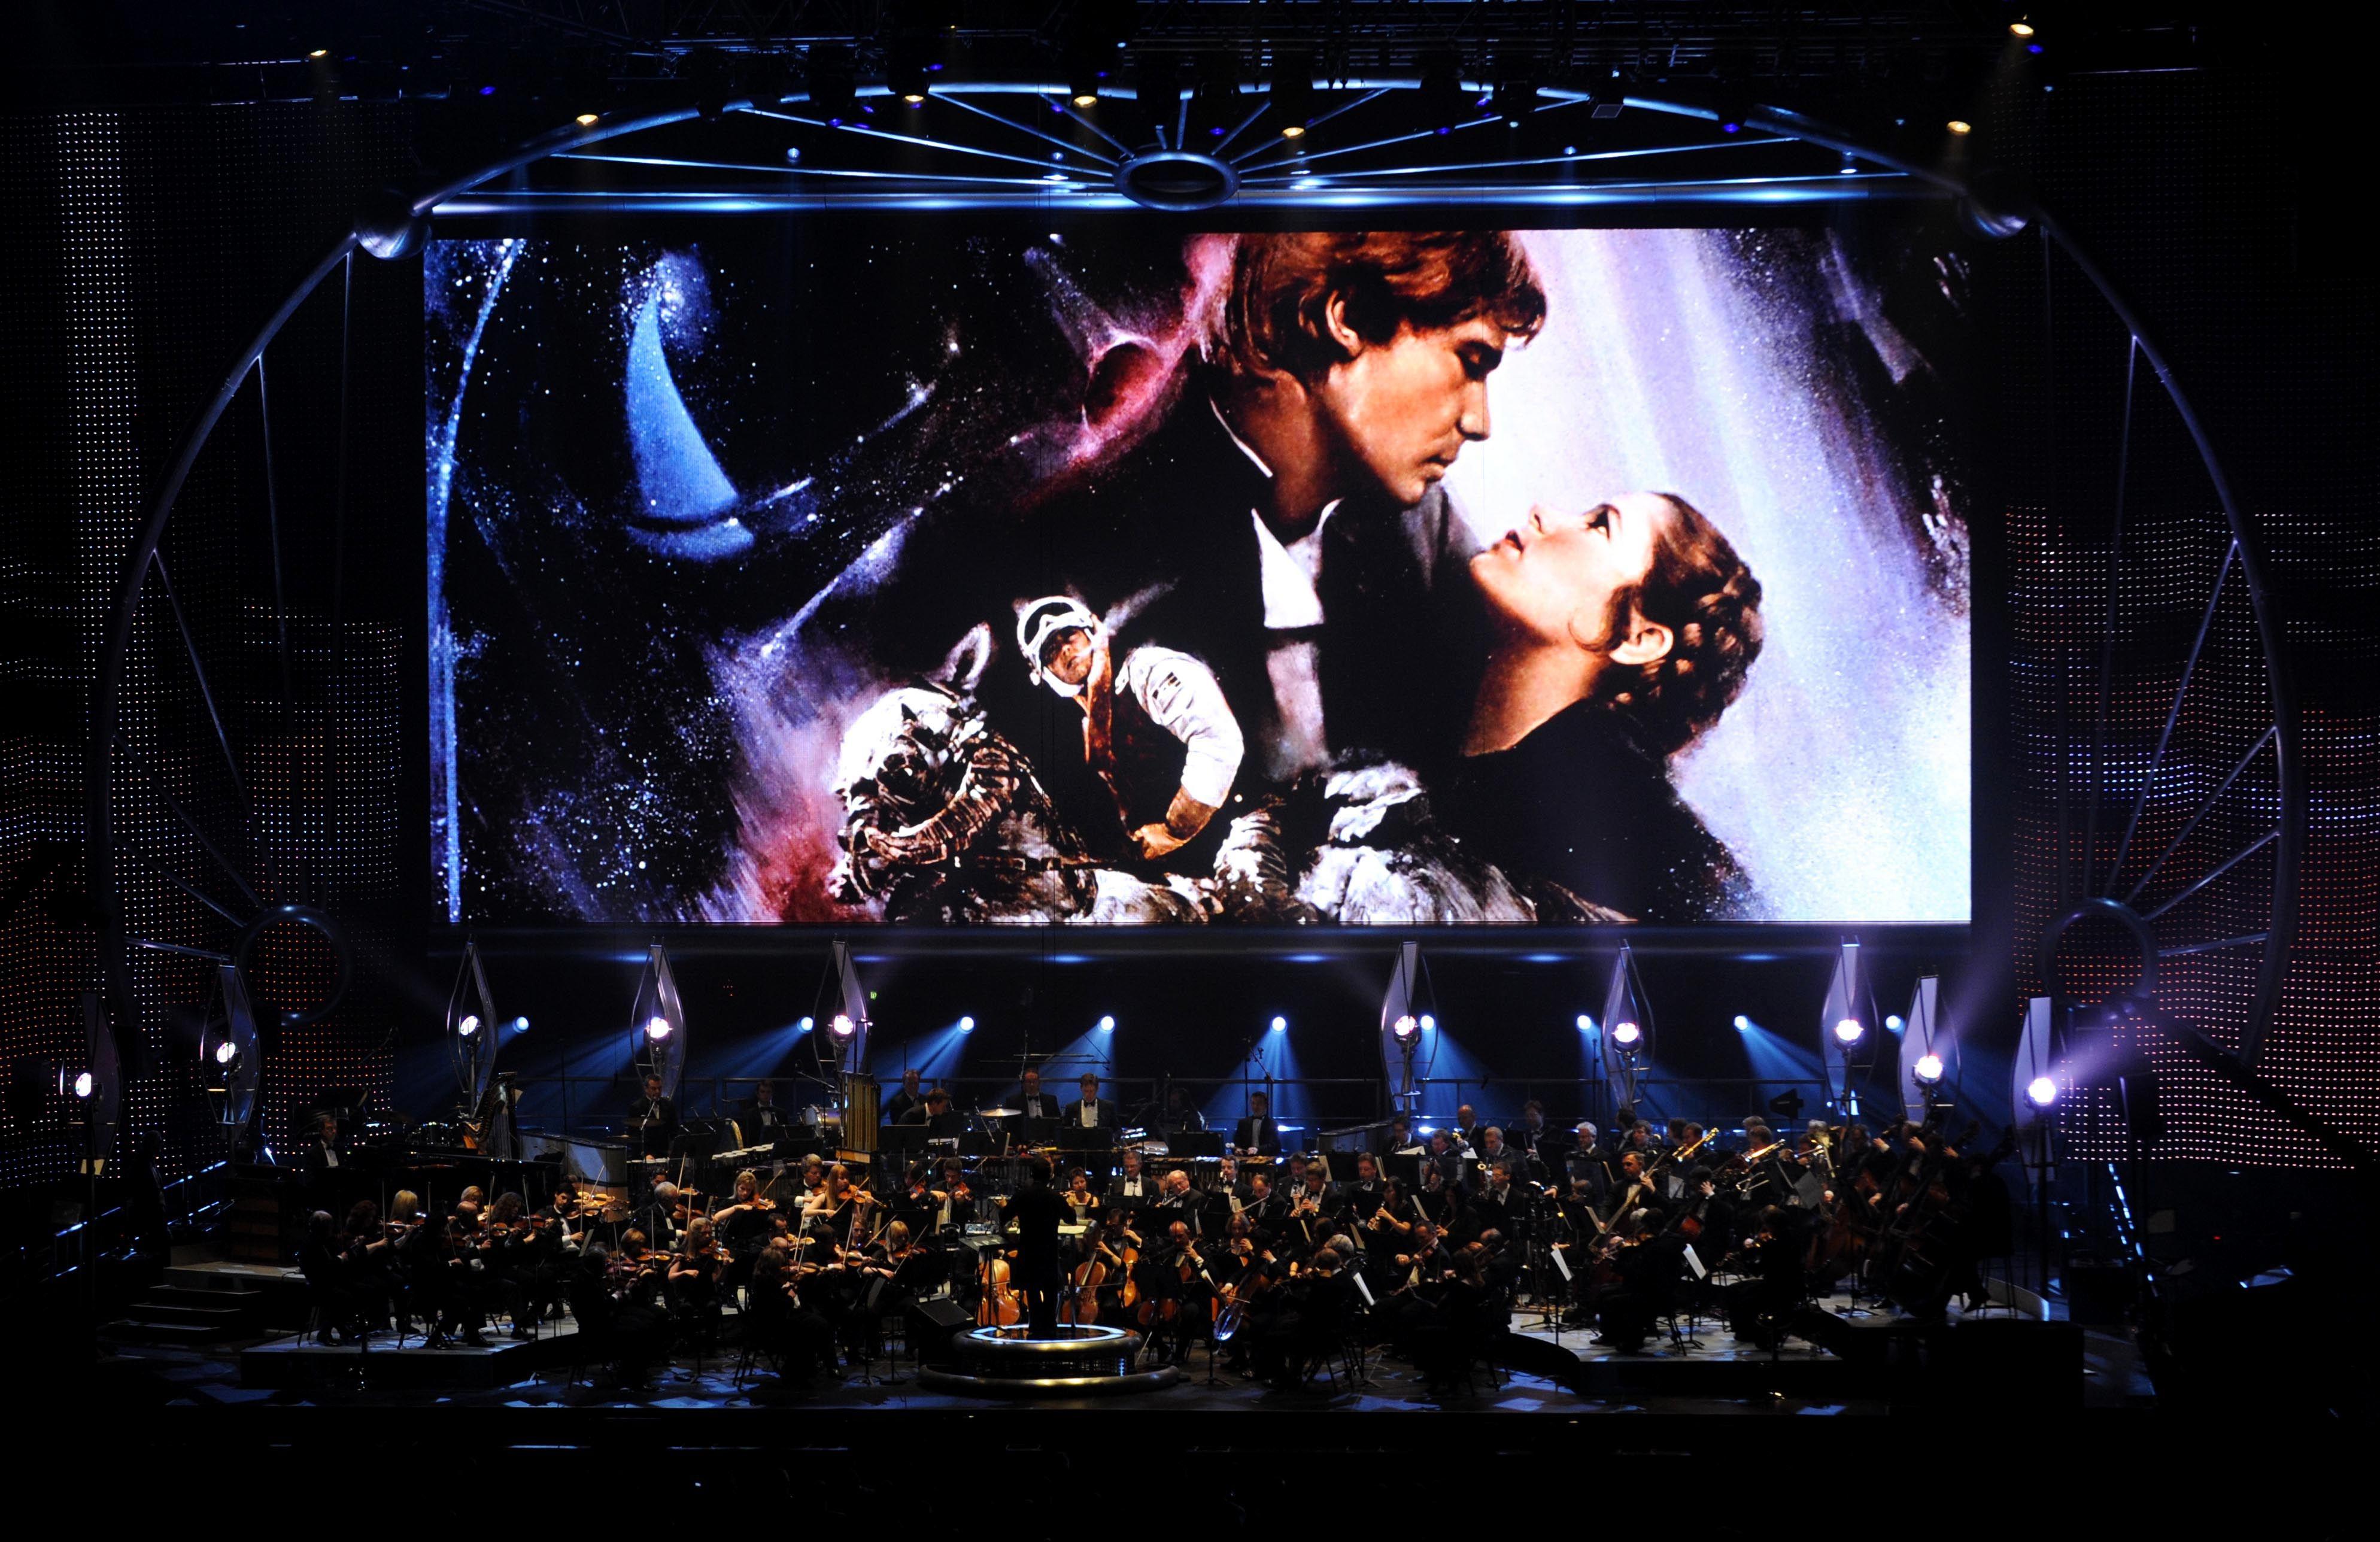 Star Wars symphonic